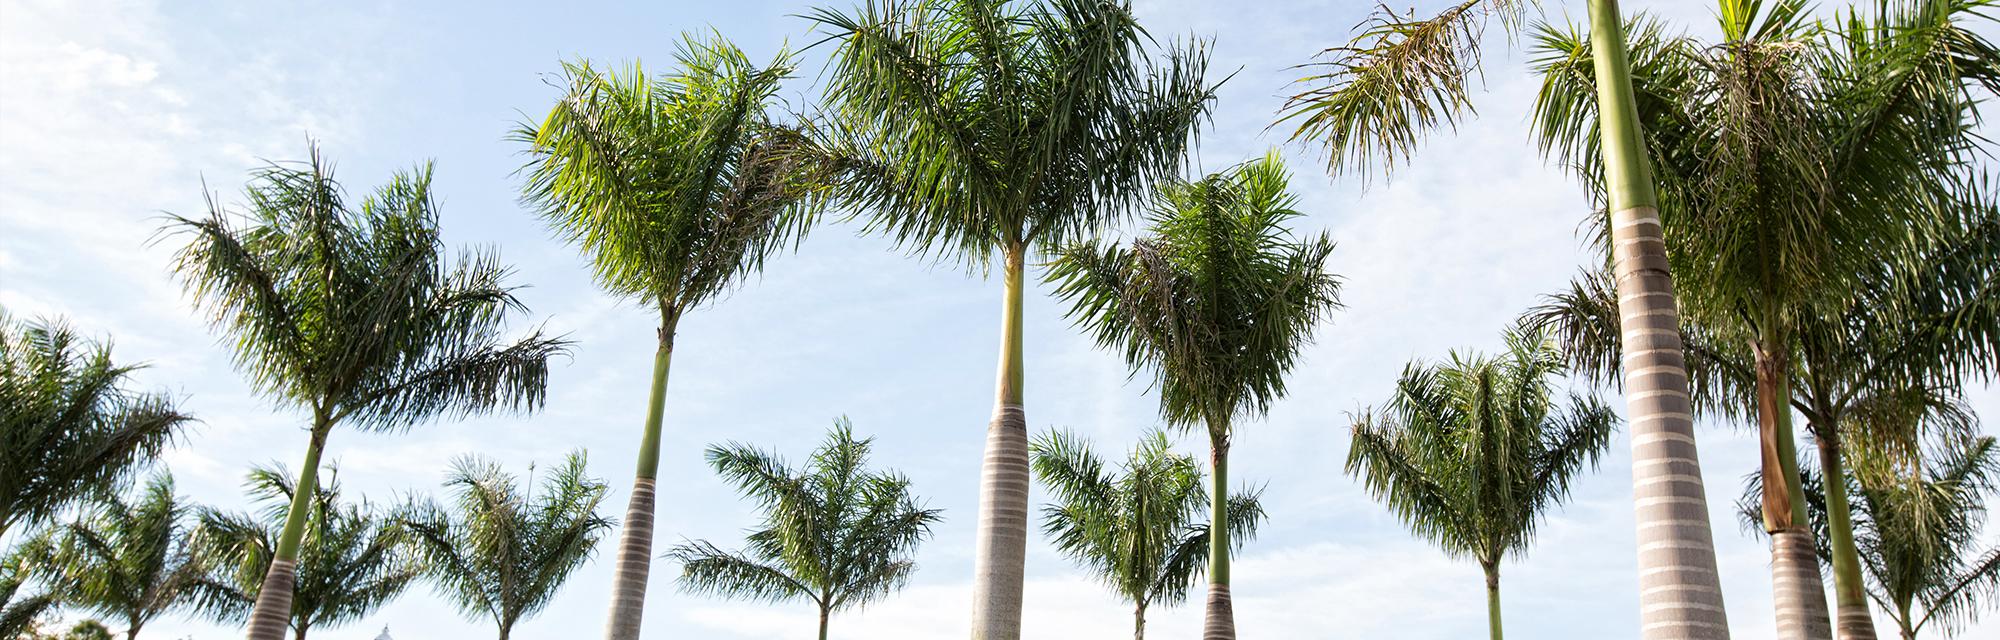 Contact Us Sinai Residences of Boca Raton